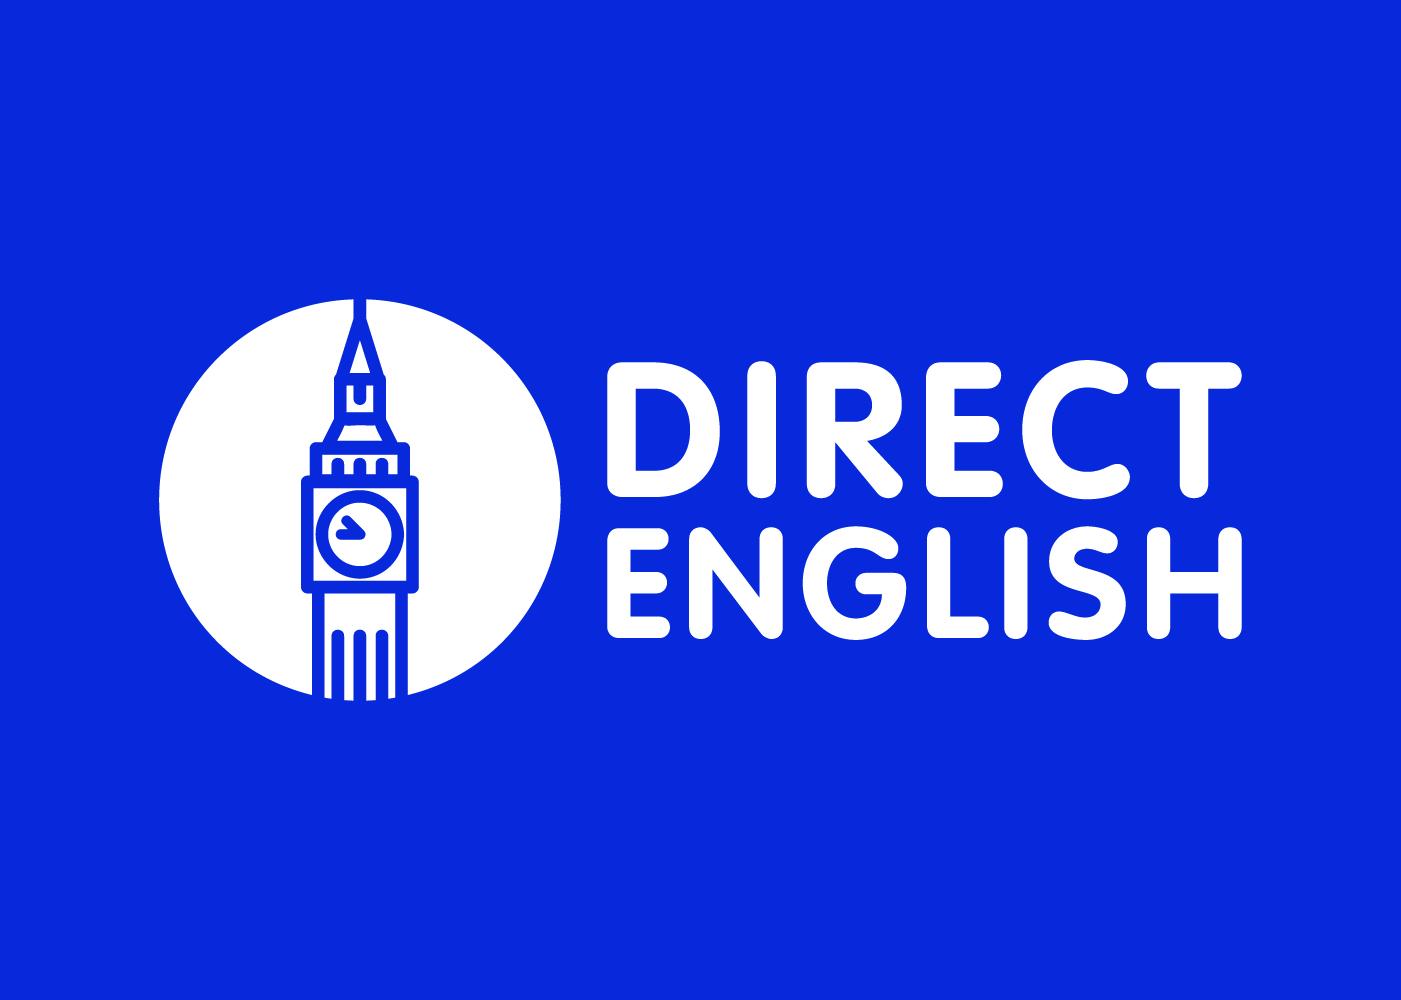 DIRECT ENGLISH_3